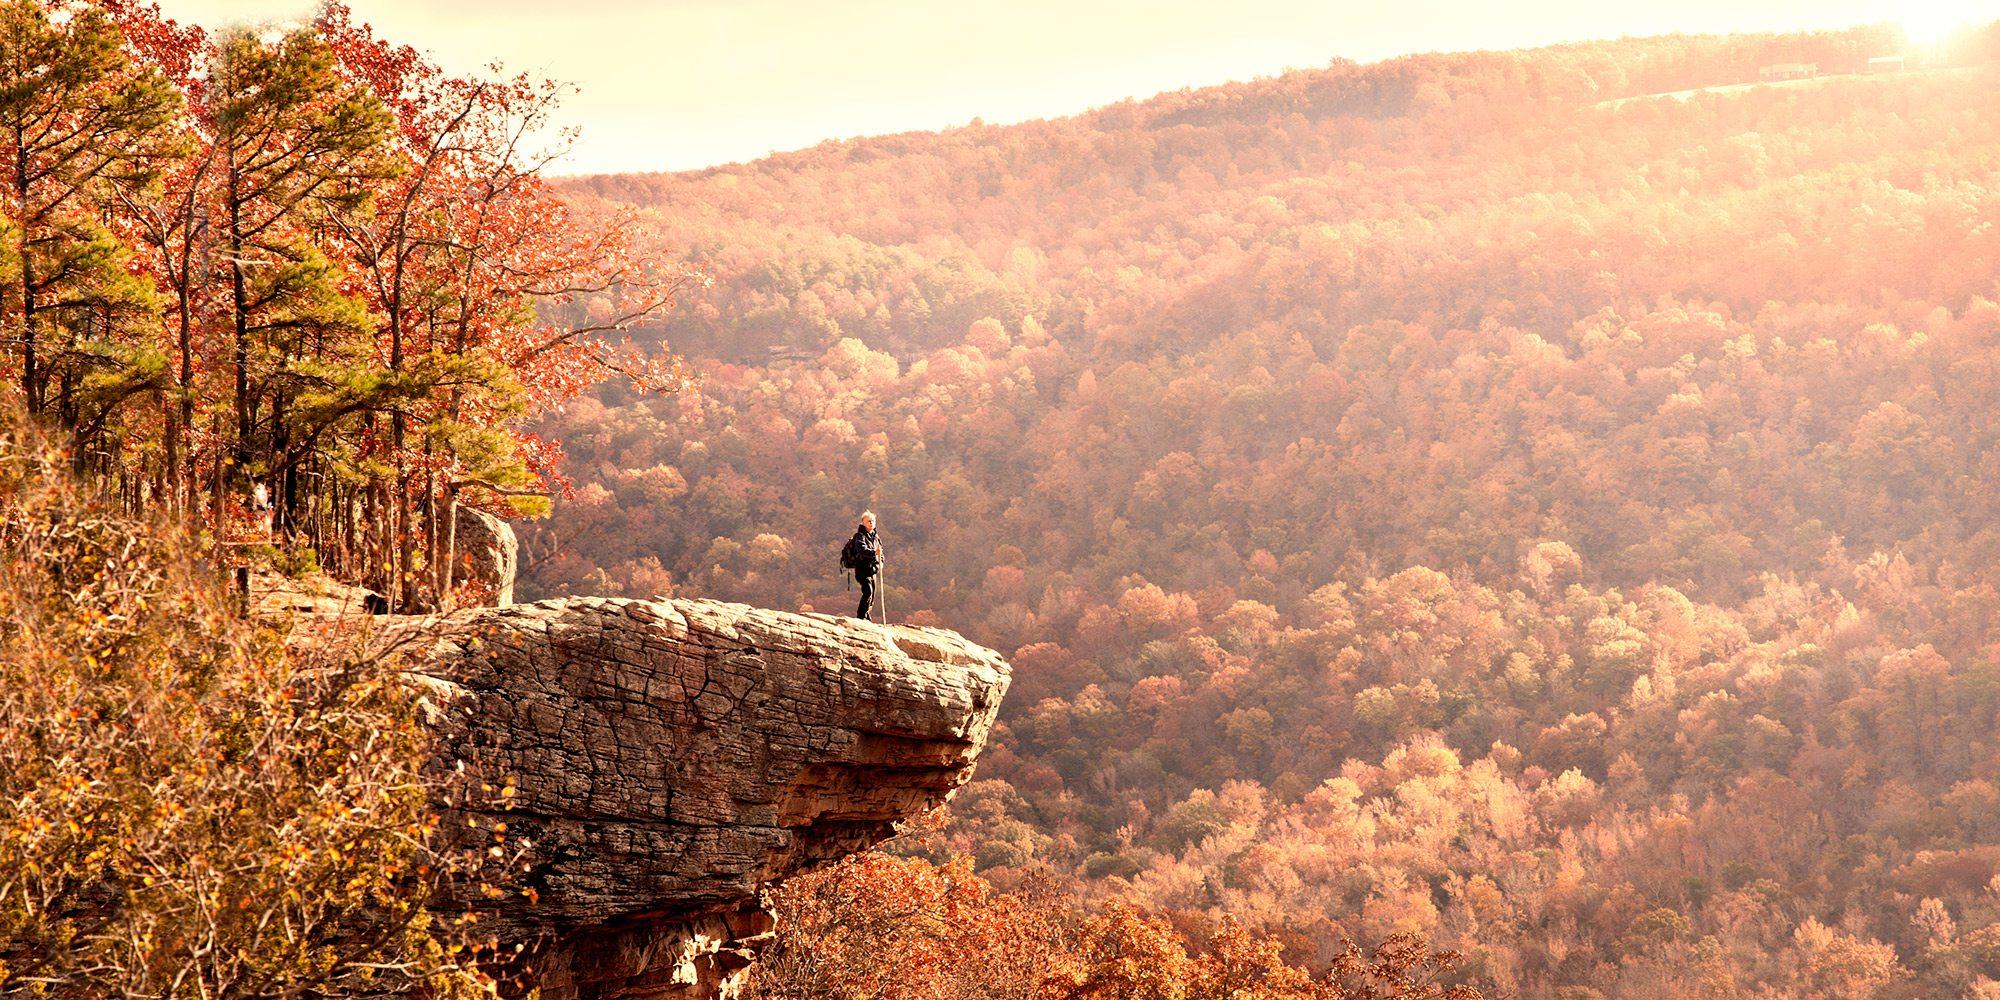 Man on a rock ledge along Hawksbill Crag in Arkansas